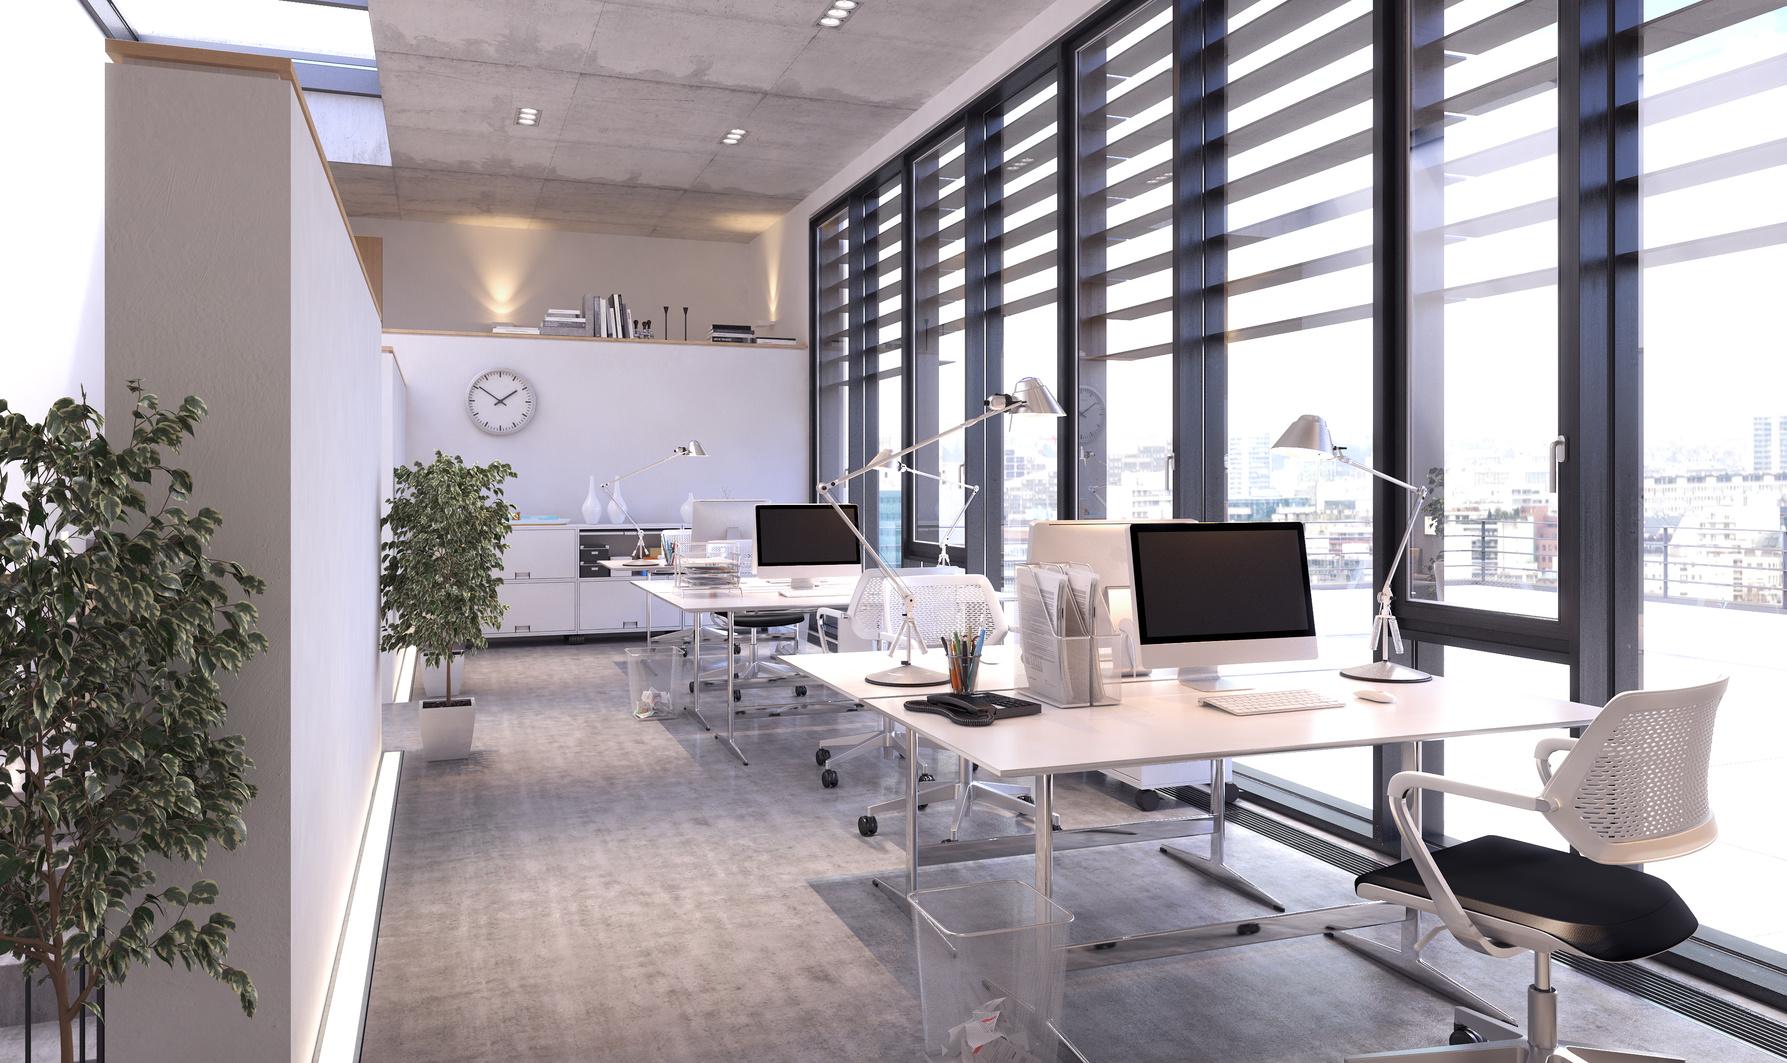 Modernes Bro -  modern Office